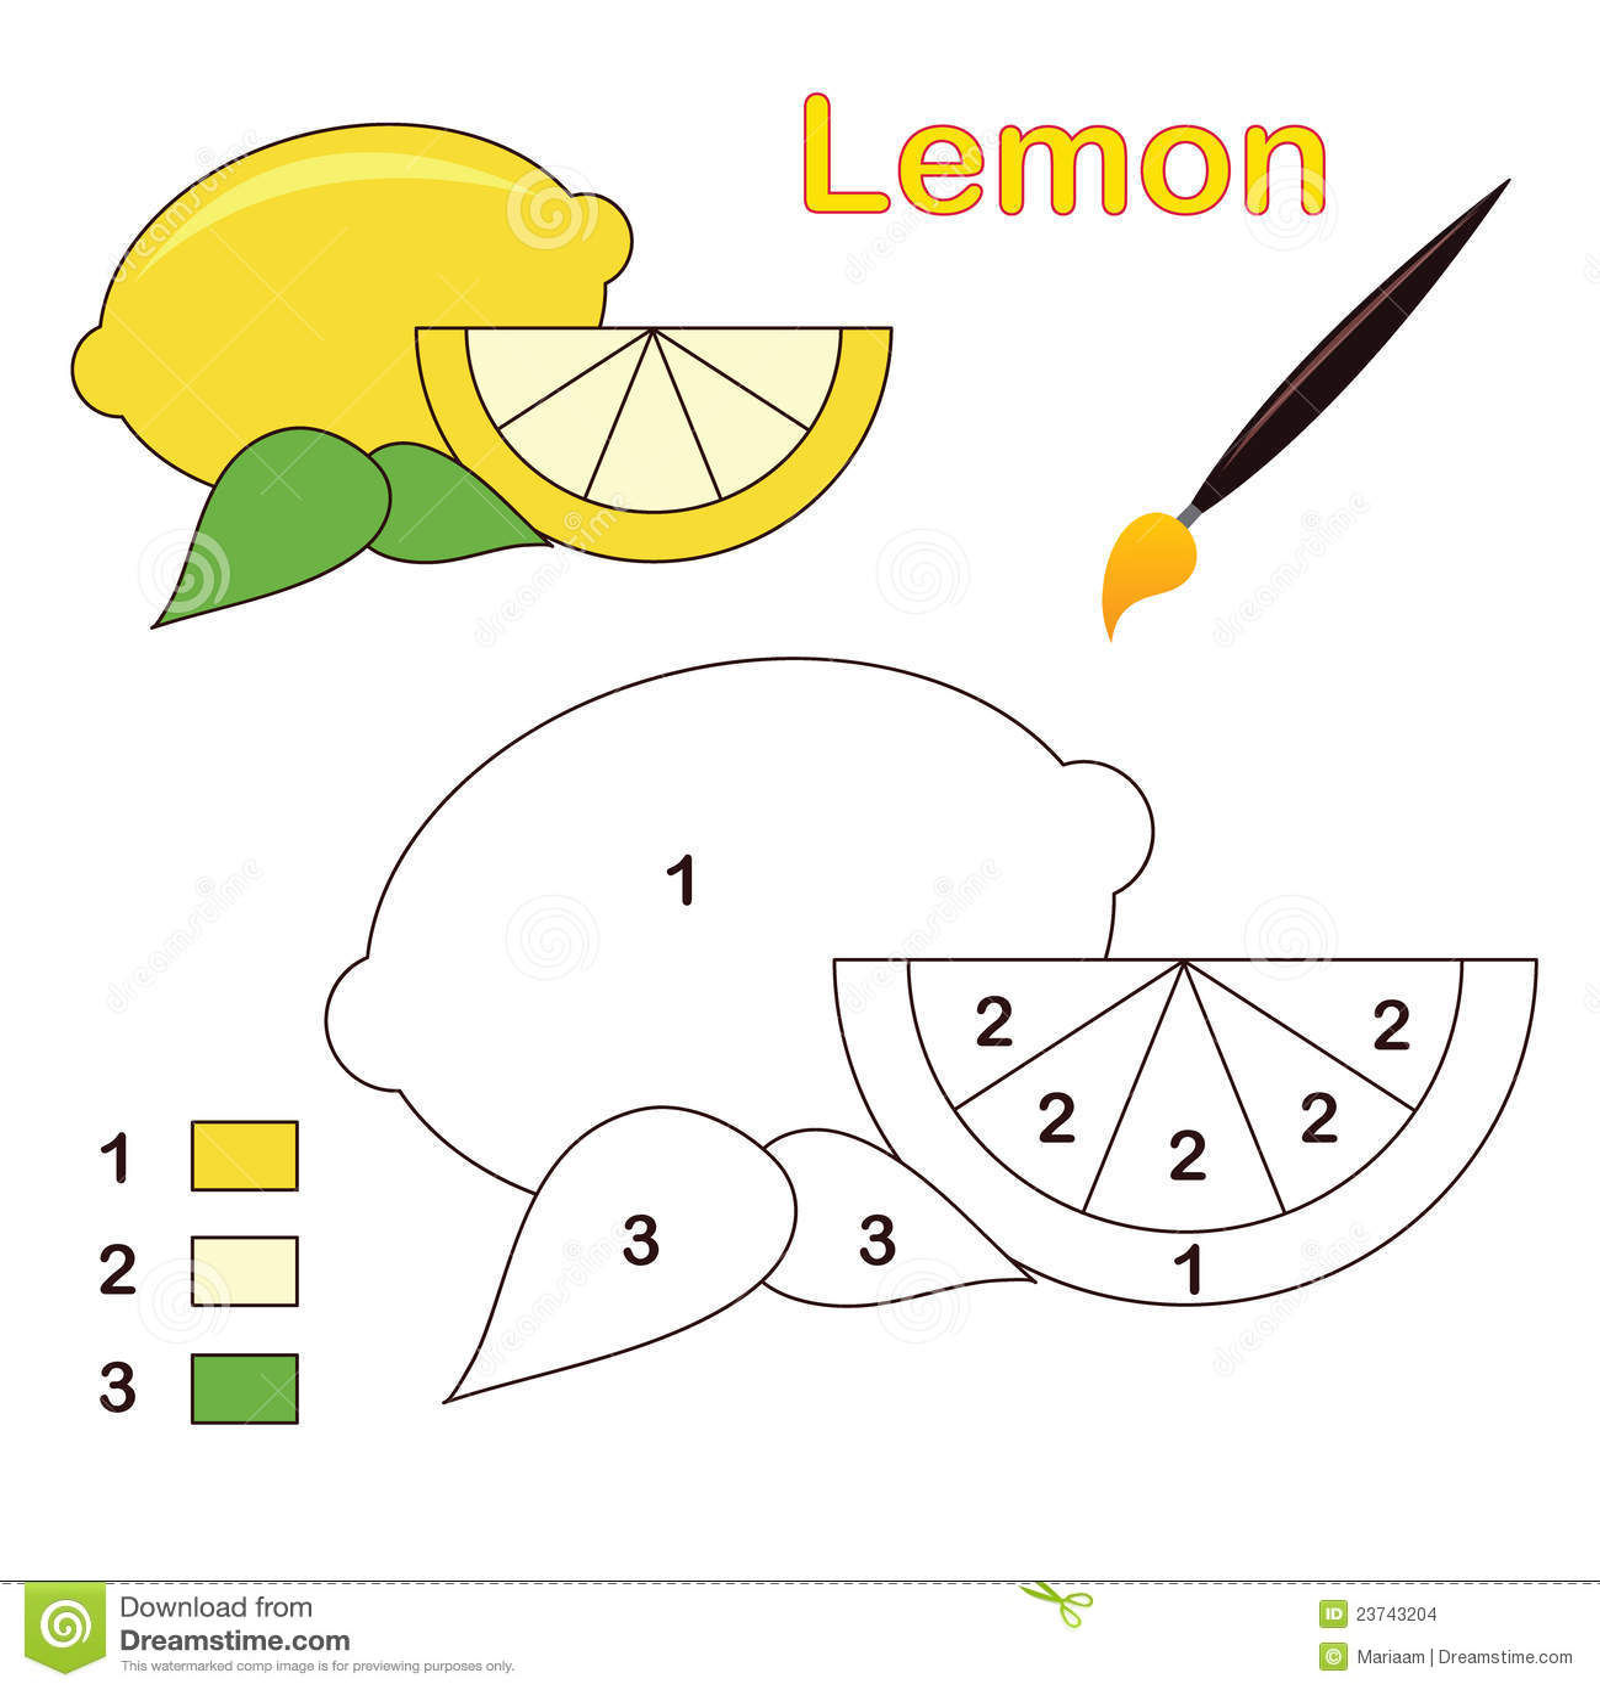 Farbe durch Zahl: Zitrone